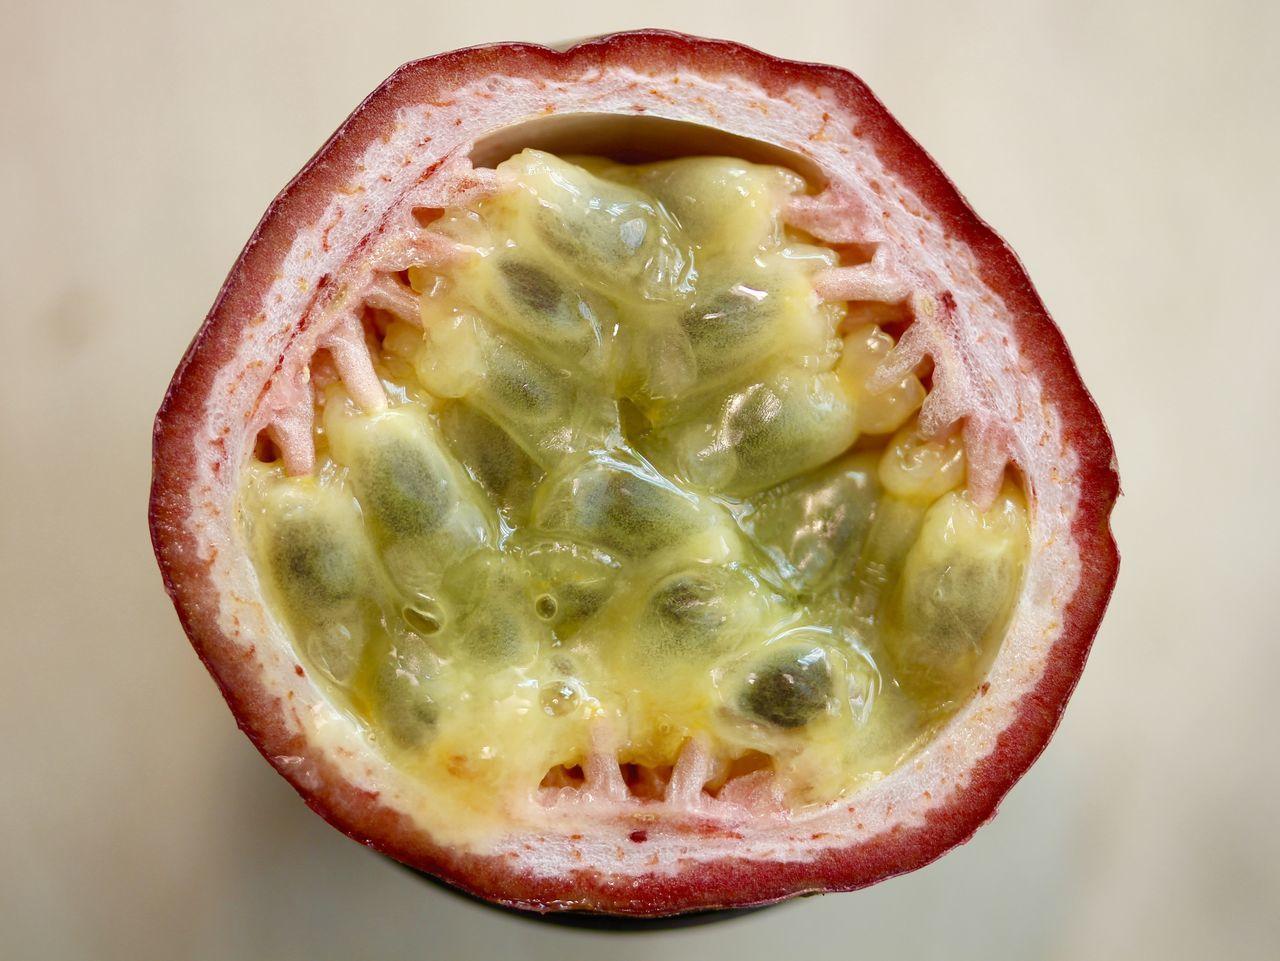 Fruit Maracujá Maracujá Maracuya Passionfruit Passionsfrucht Frucht Exotic Macro Fruits